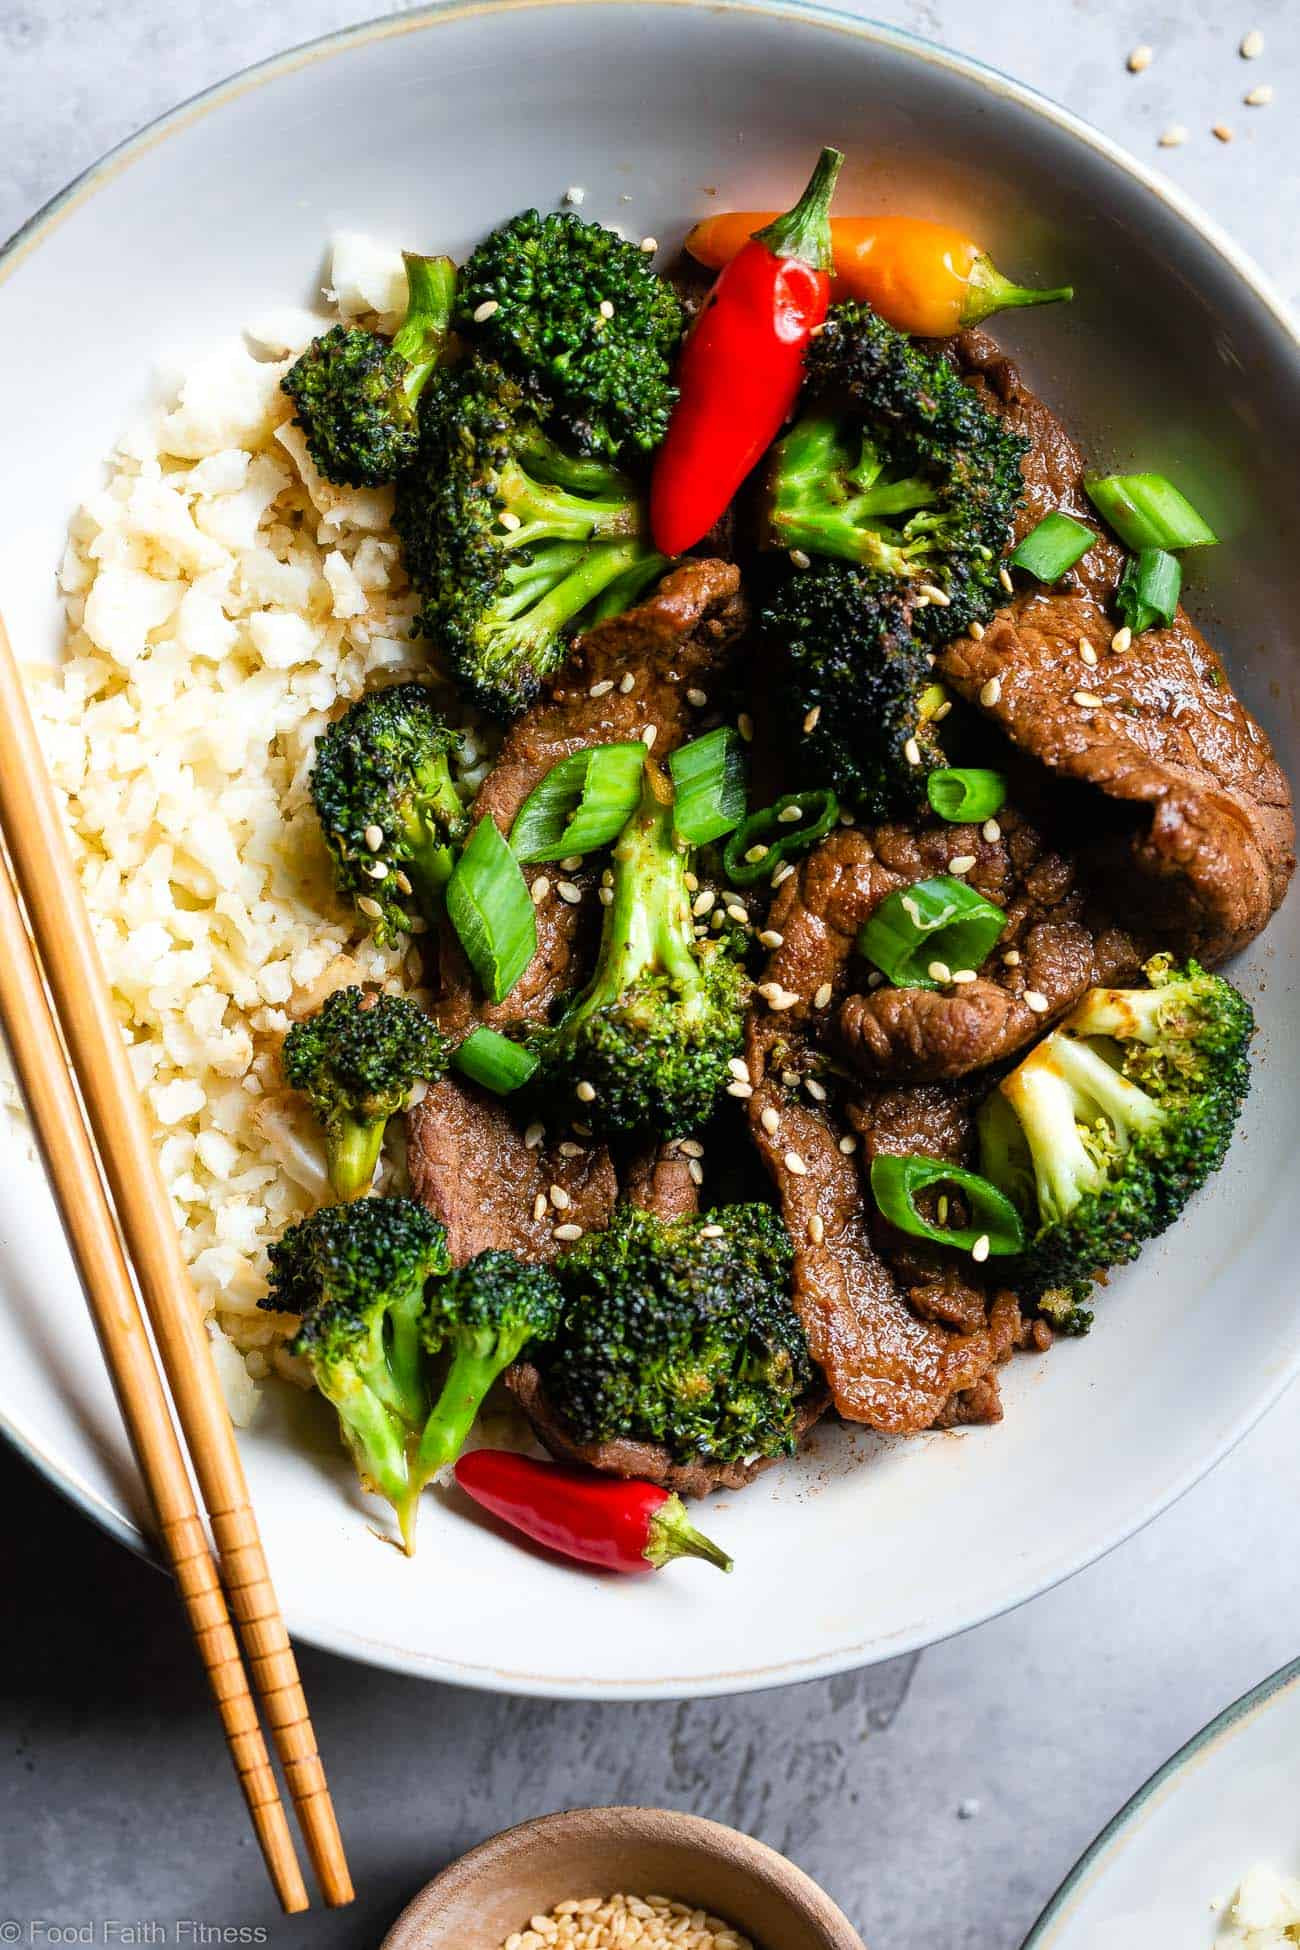 Keto Beef And Broccoli  Paleo Low Carb Keto Beef and Broccoli